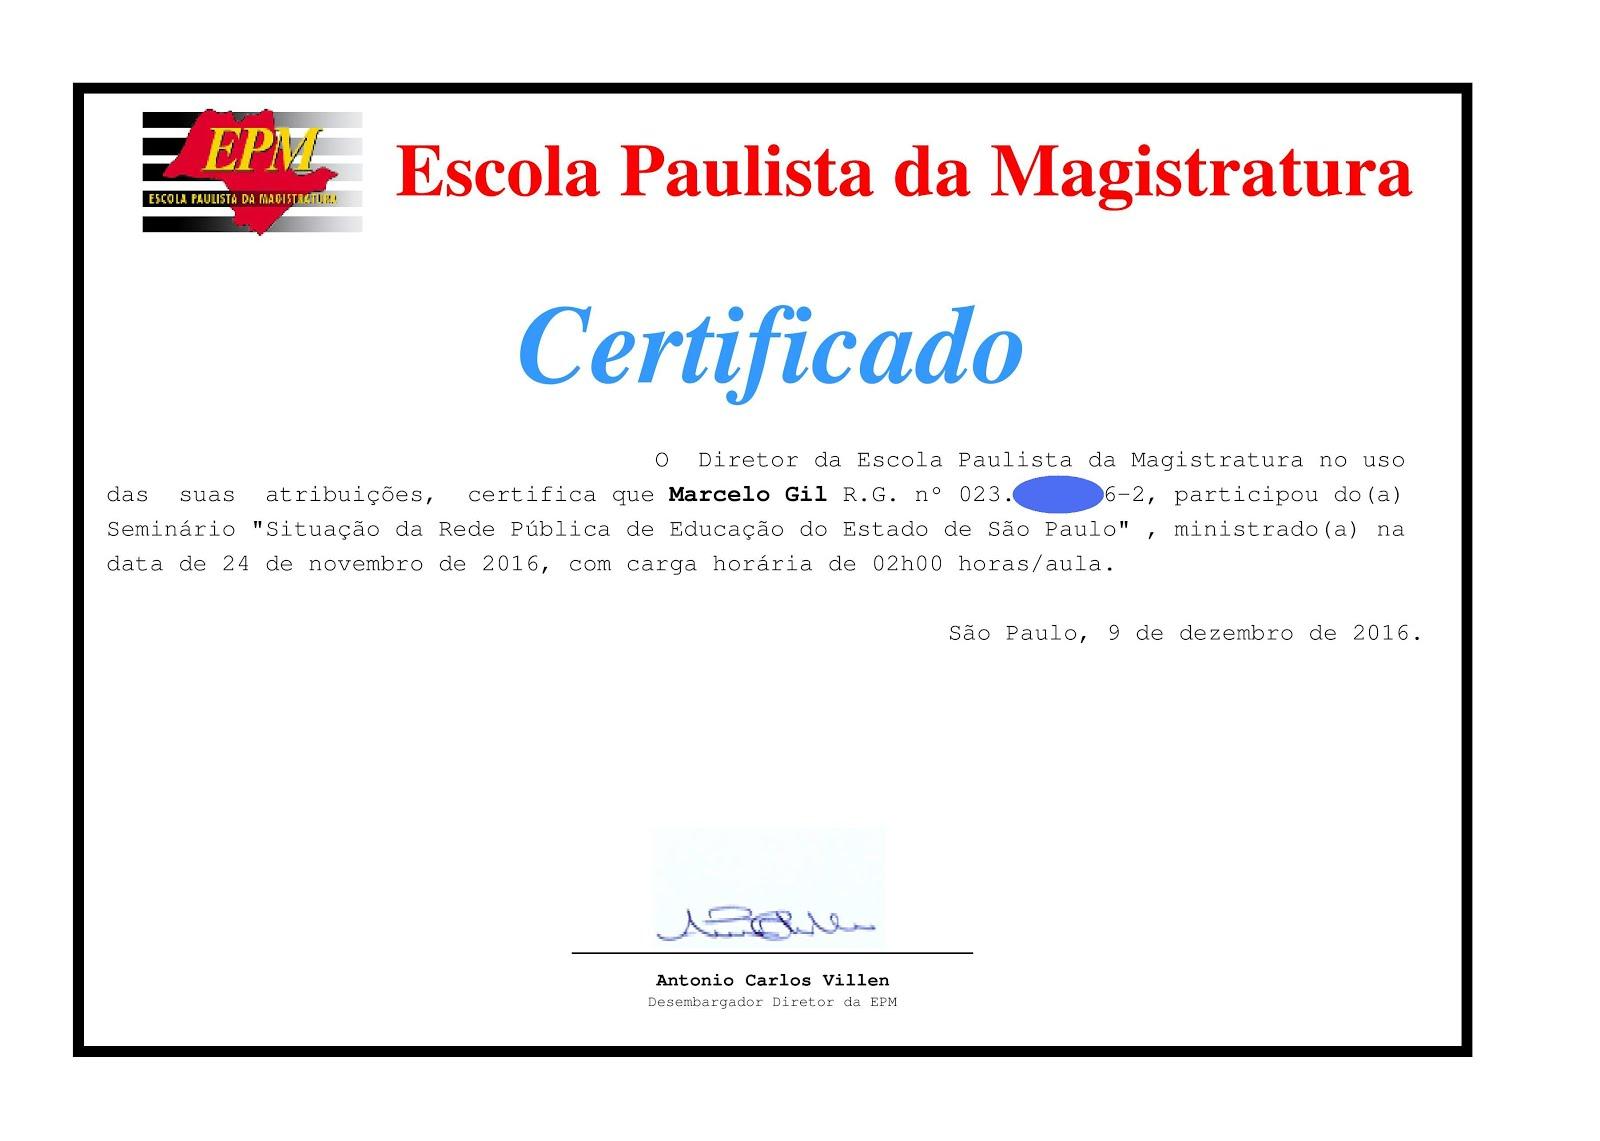 CERTIFICADO DA ESCOLA PAULISTA DE MAGISTRATURA CONCEDIDO À MARCELO GIL / 2016